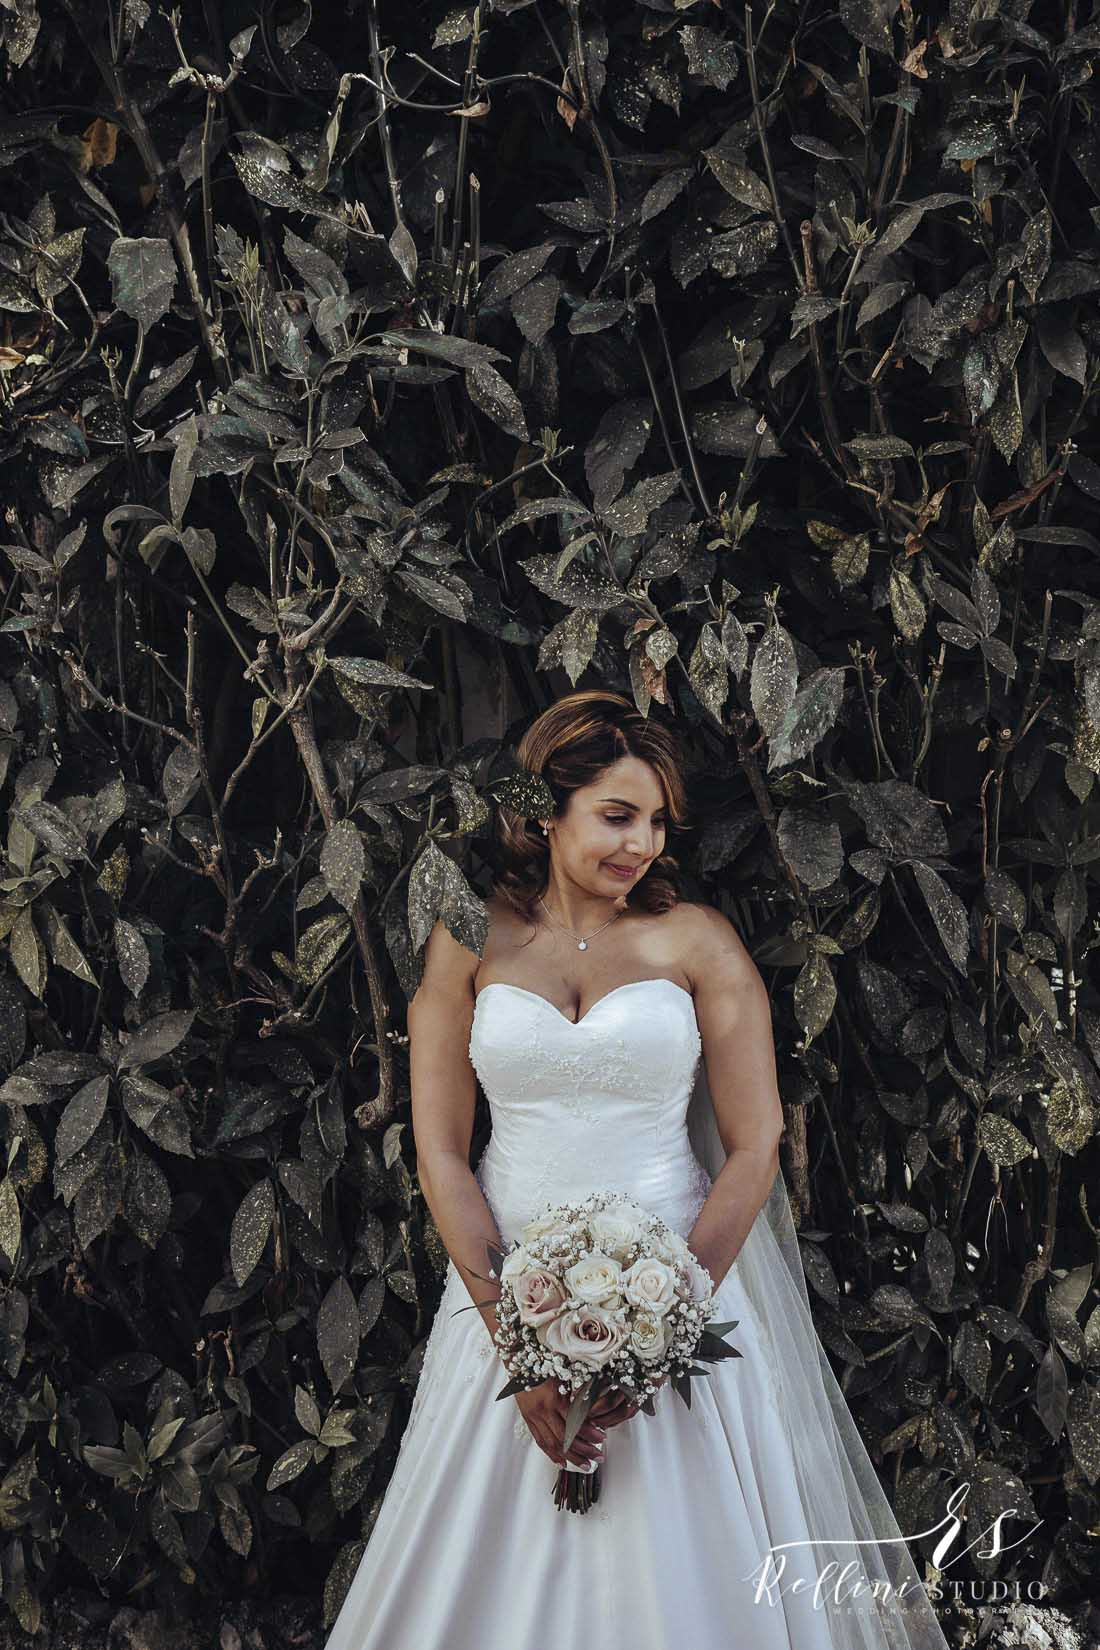 wedding como lake 099.jpg